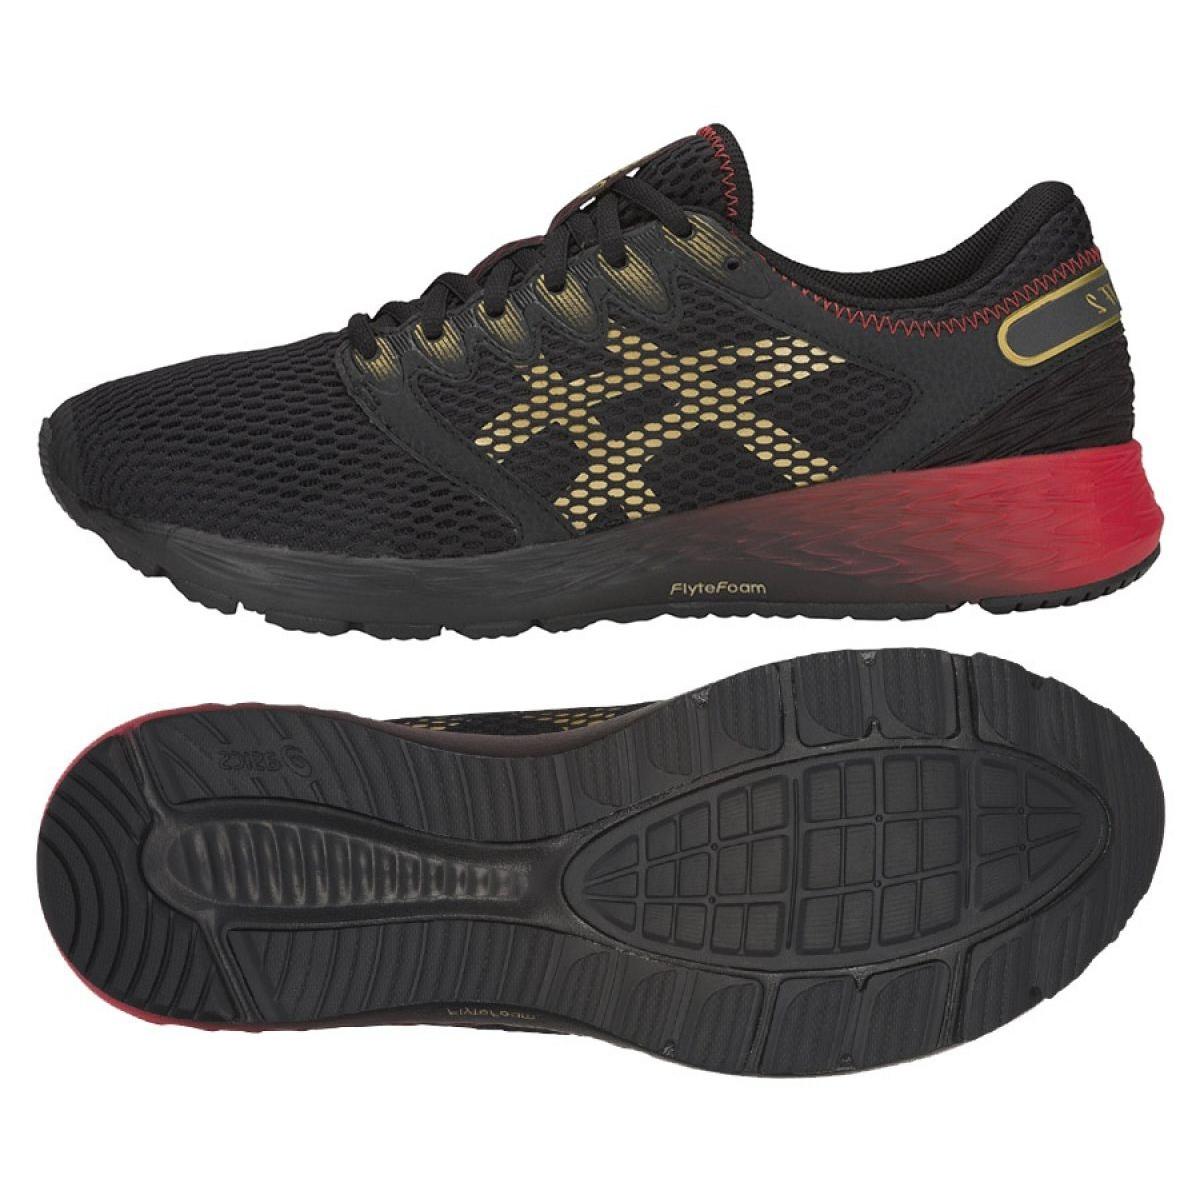 Running shoes Asics RoadHawk Ff M 1011A590-001 black red yellow